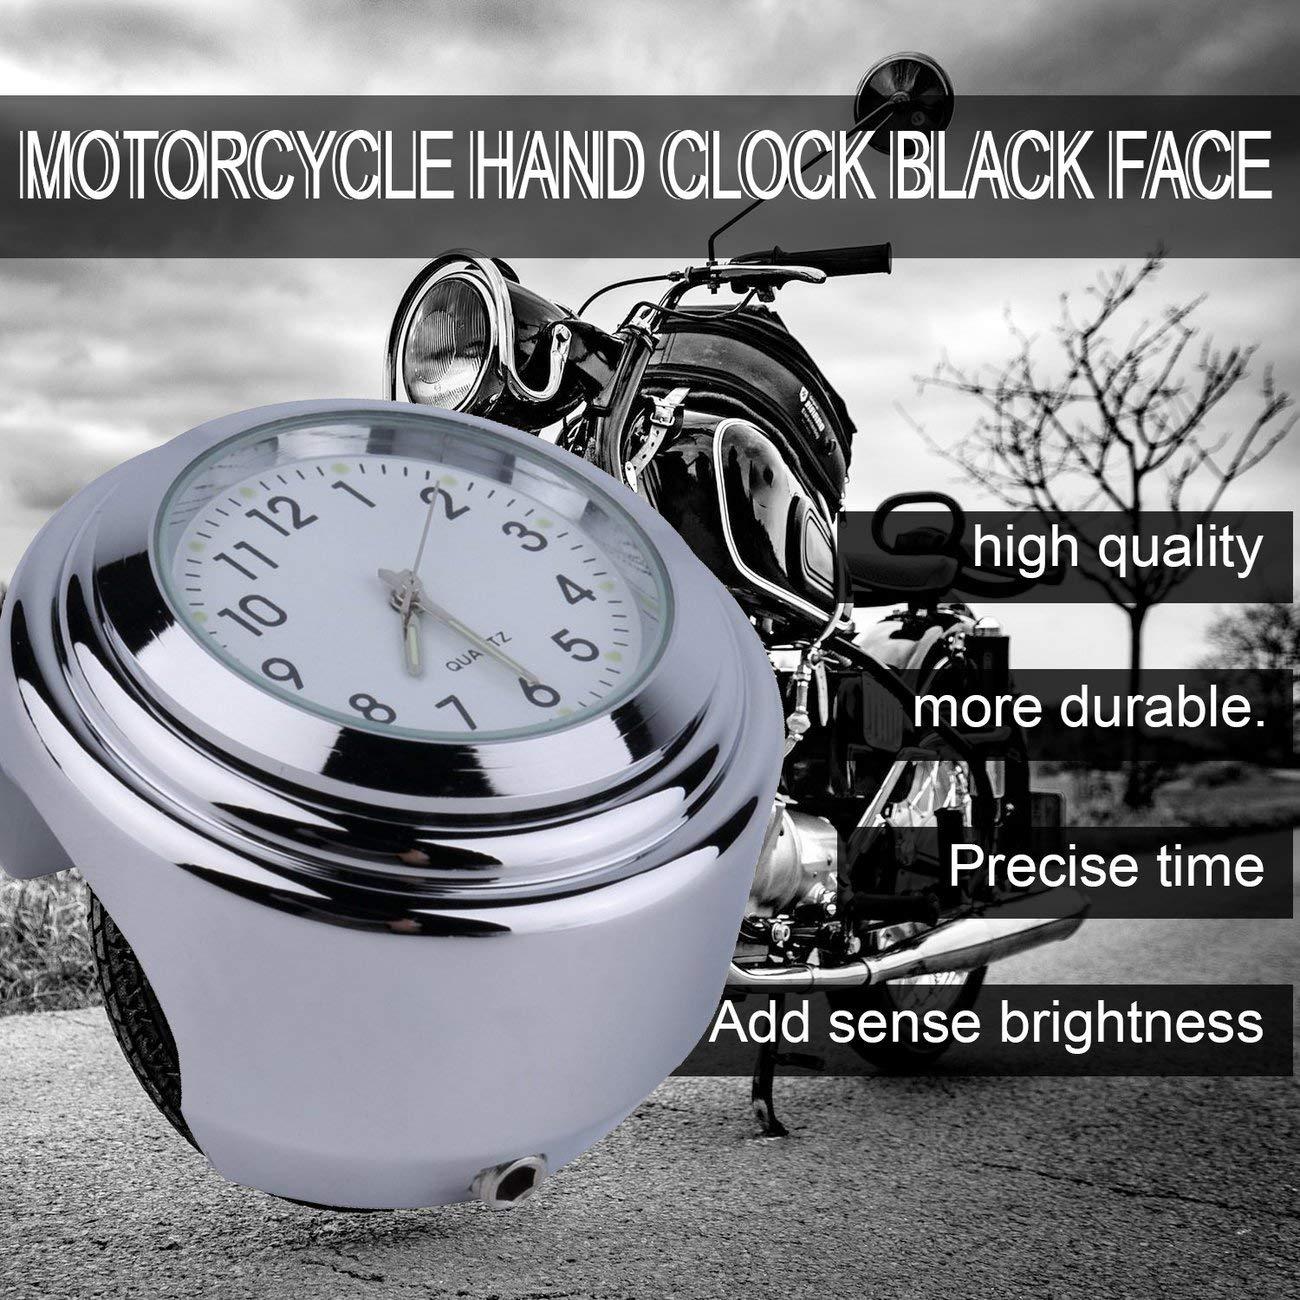 Elviray Moto /étanche Moto Guidon Montage Cadran Rond Horloge Accessoire Universel Guidon Montage Horloge